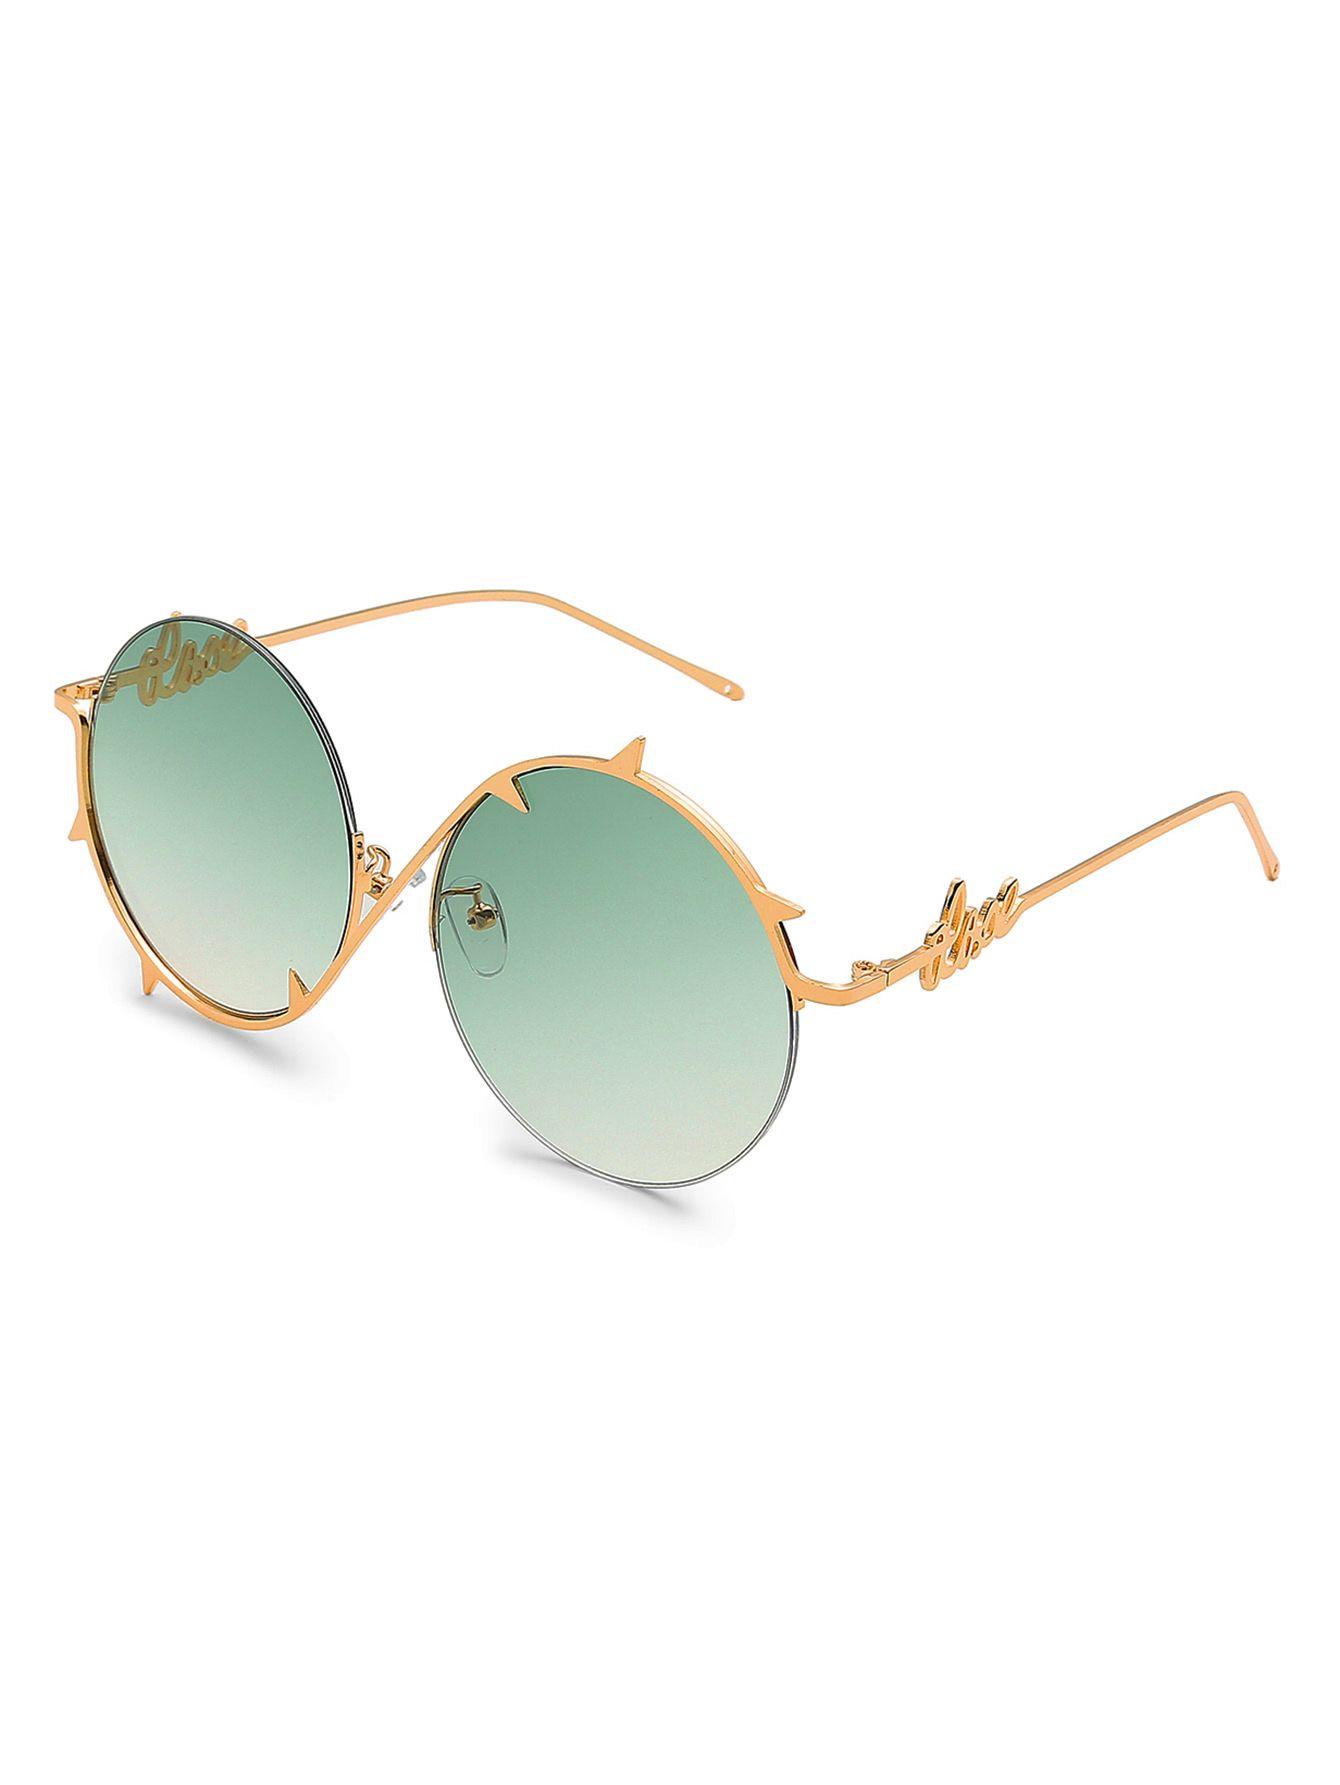 407849bd6d Shop Ombre Lens Asymmetrical Frame Round Sunglasses online. SheIn ...